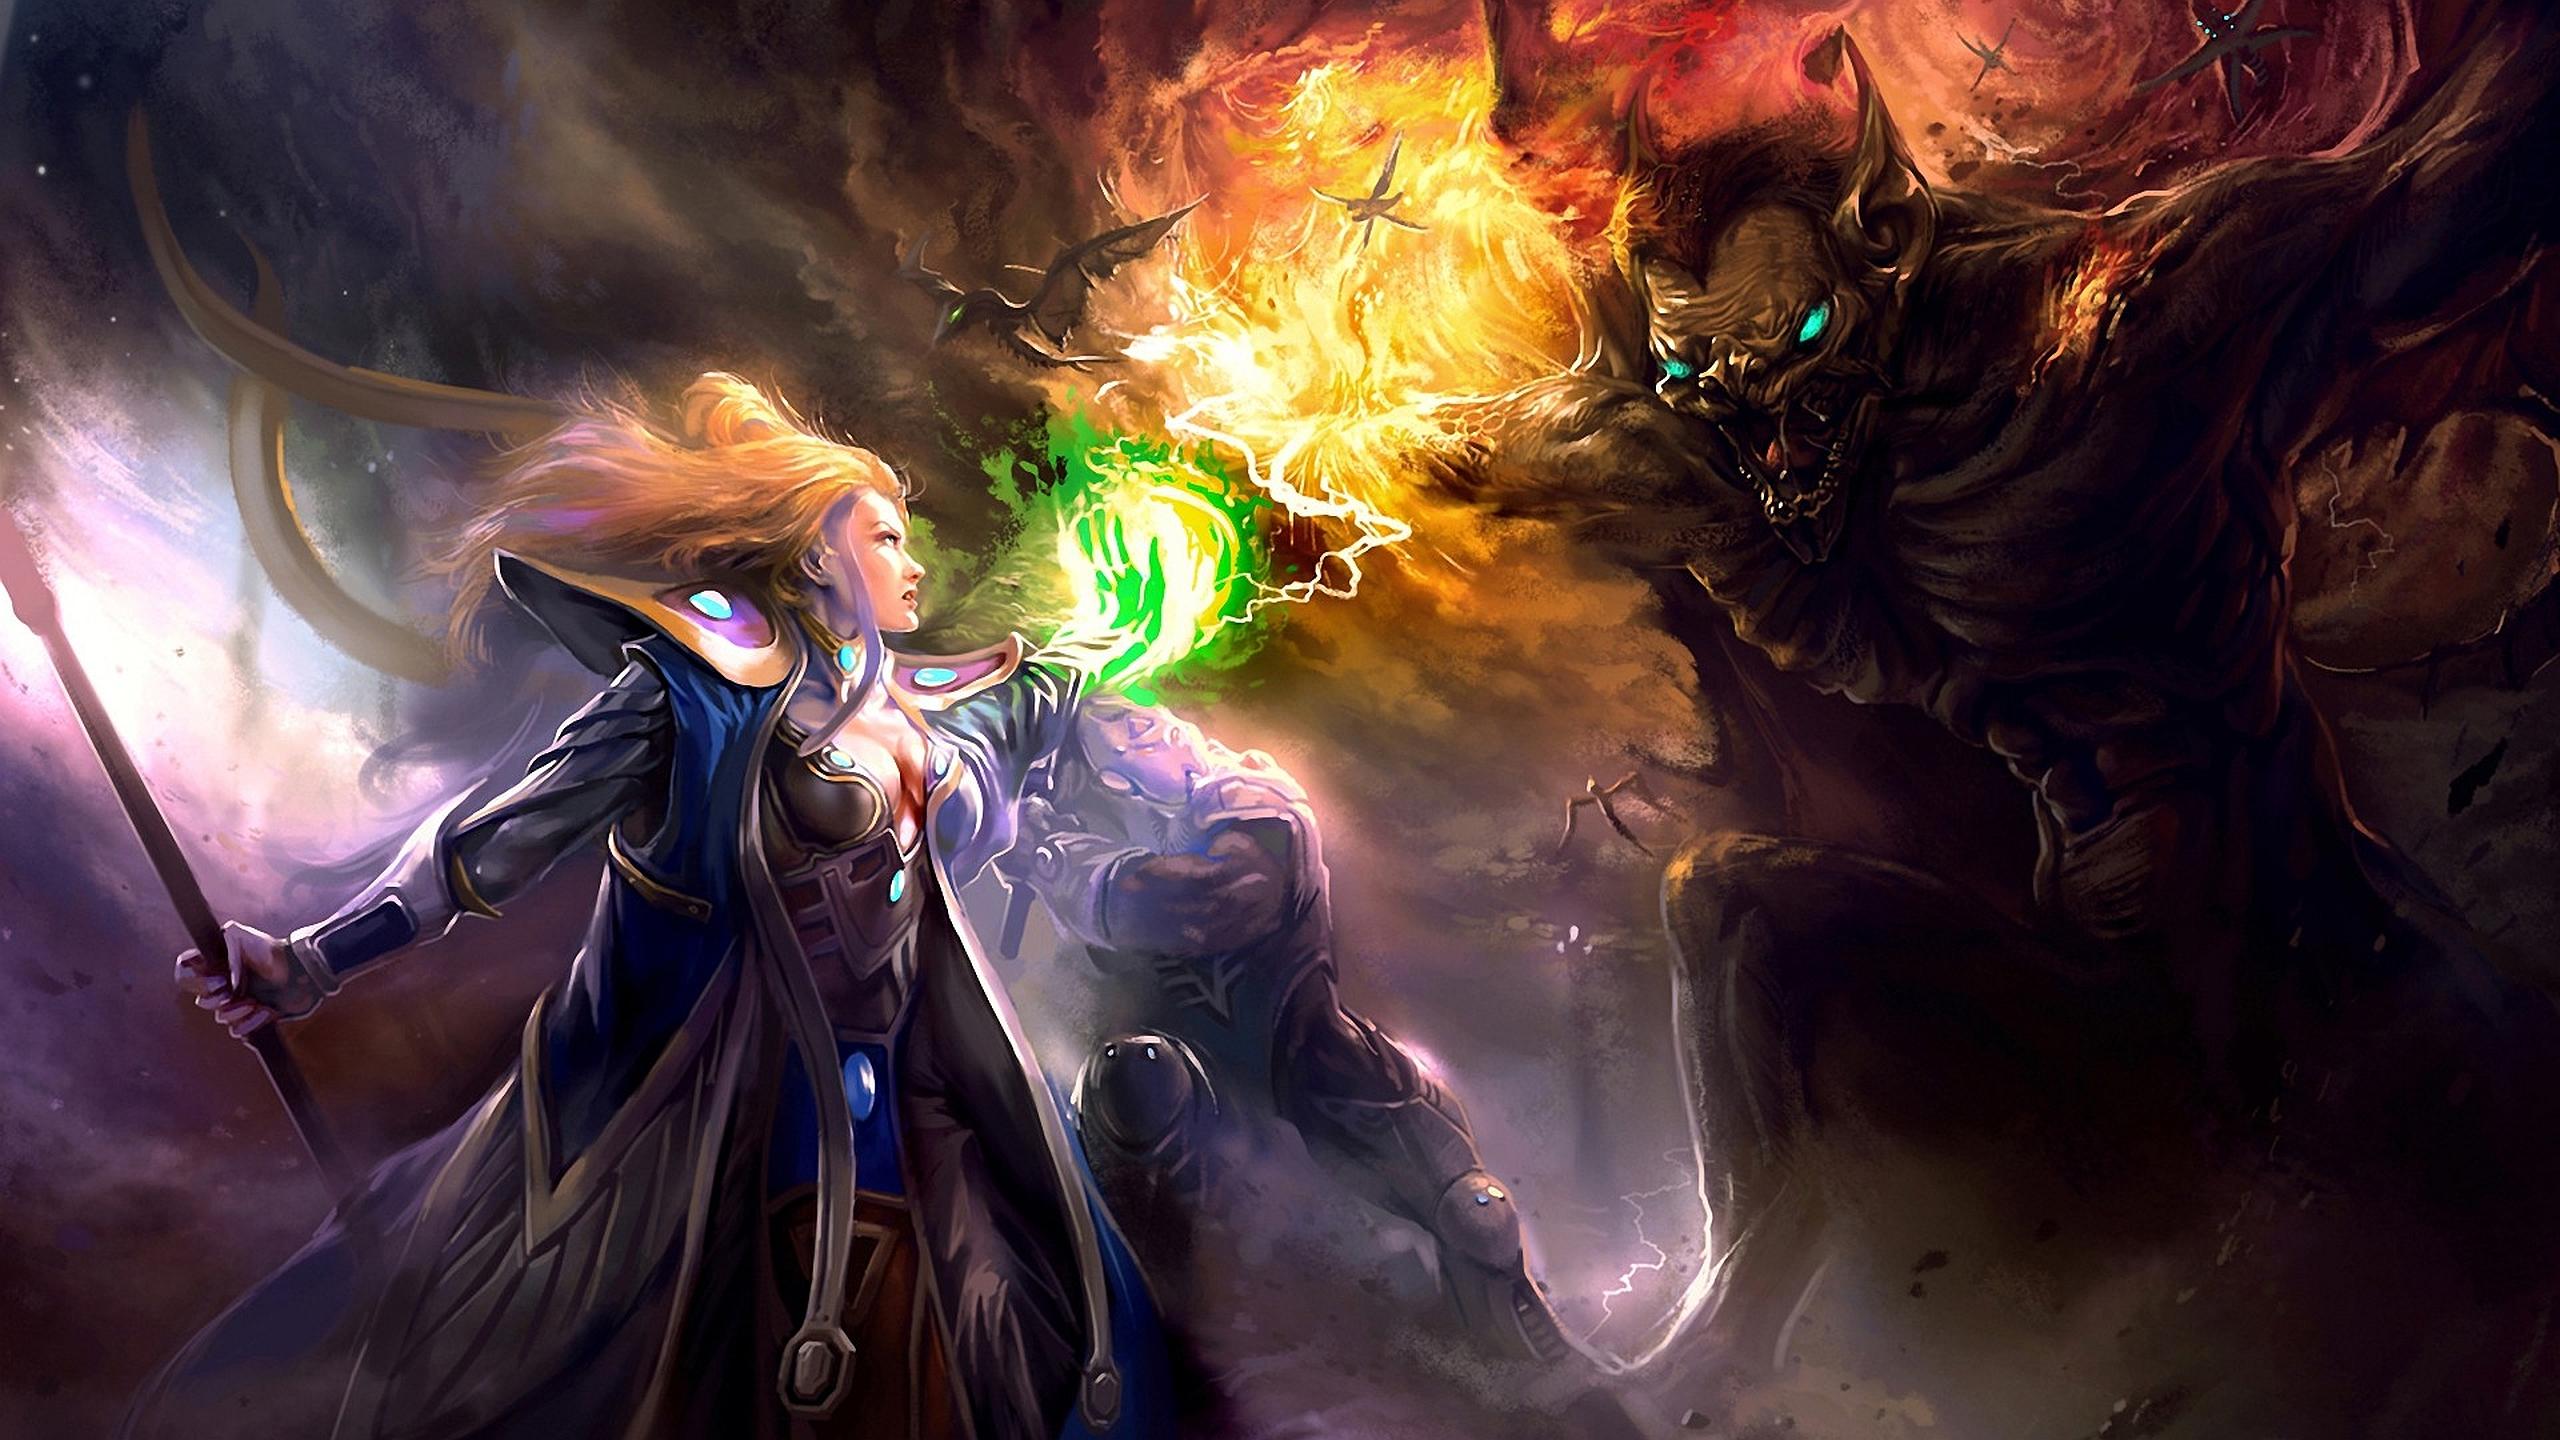 Fantasy Women Warrior 2560x1440